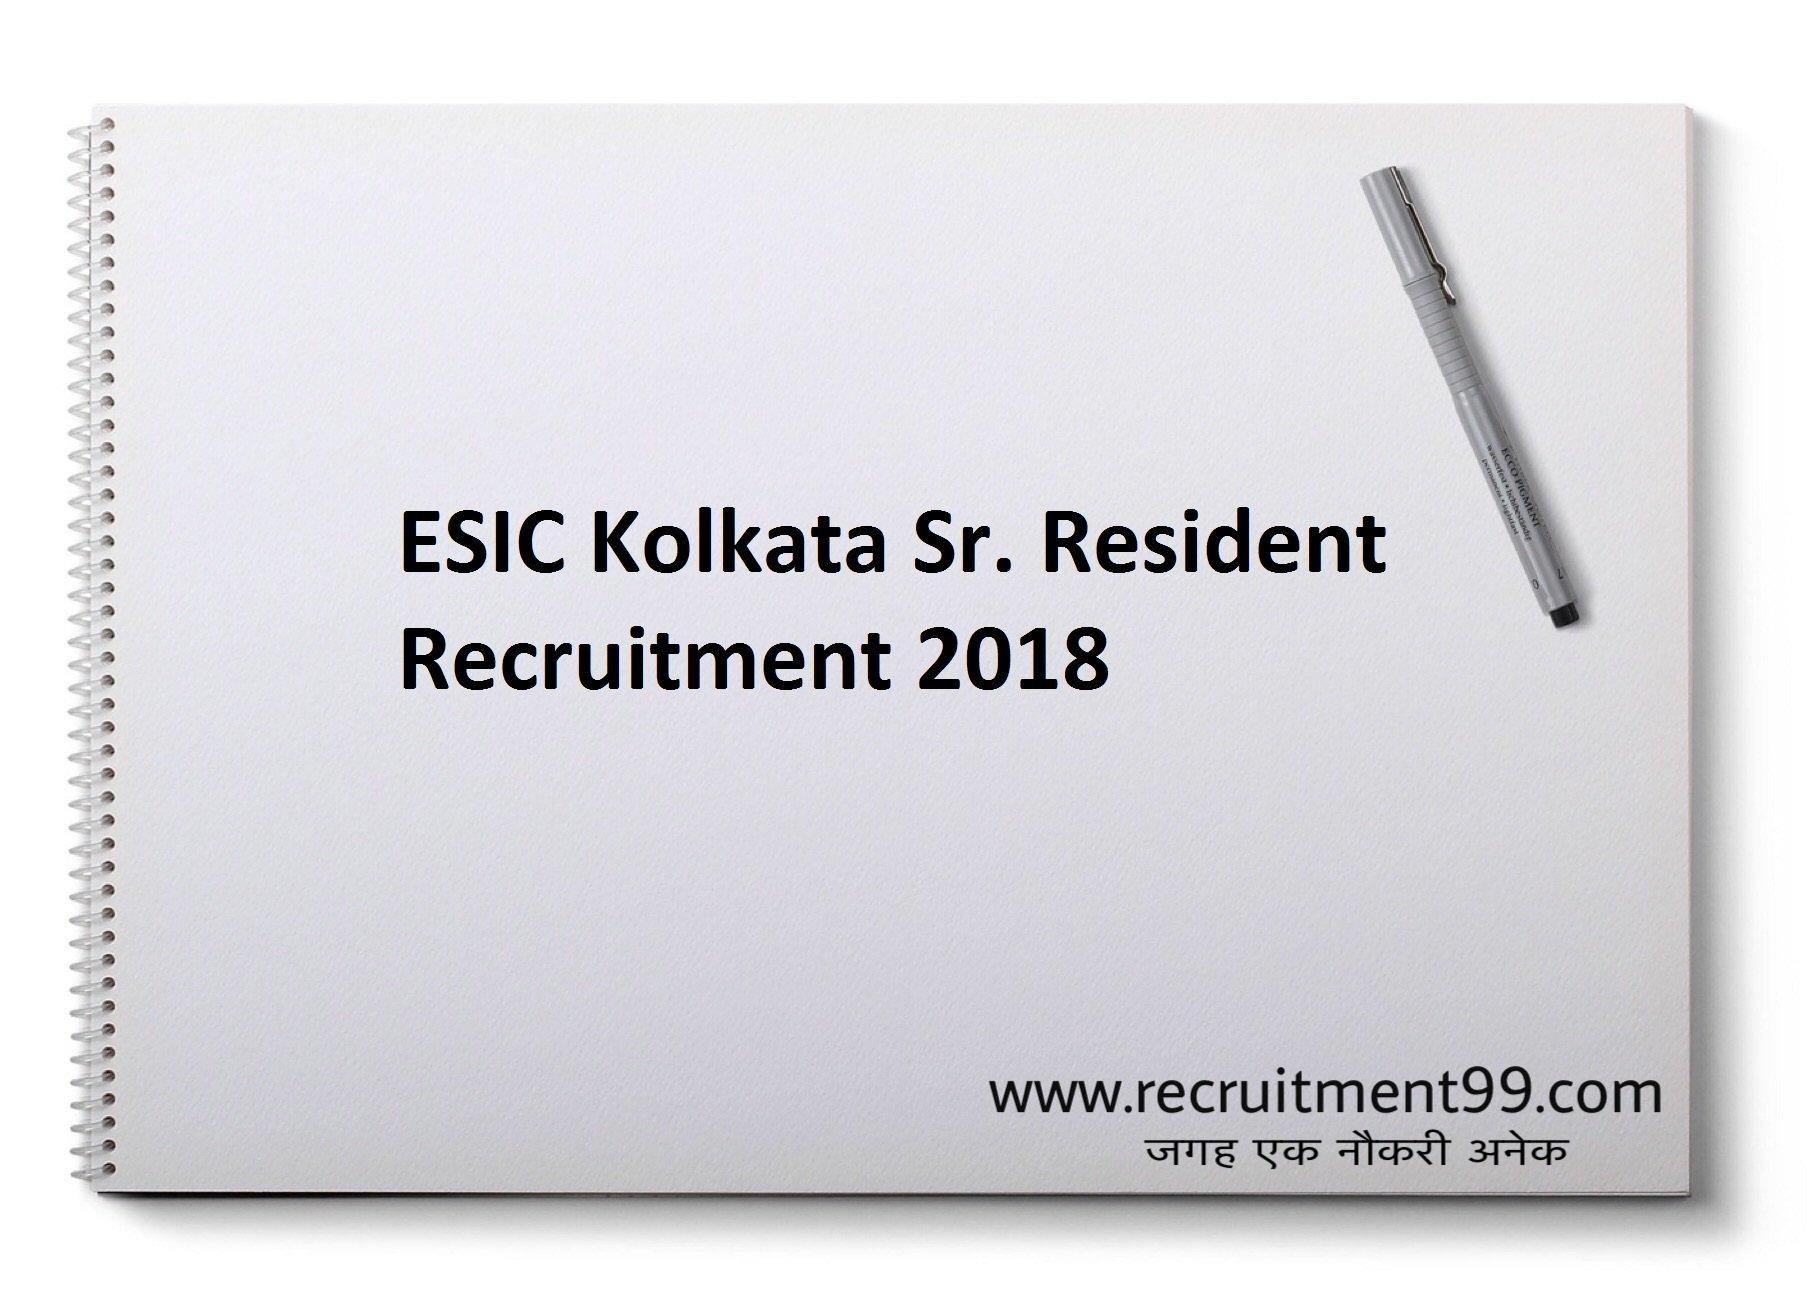 ESIC Kolkata Senior Resident Recruitment Admit Card Result 2018